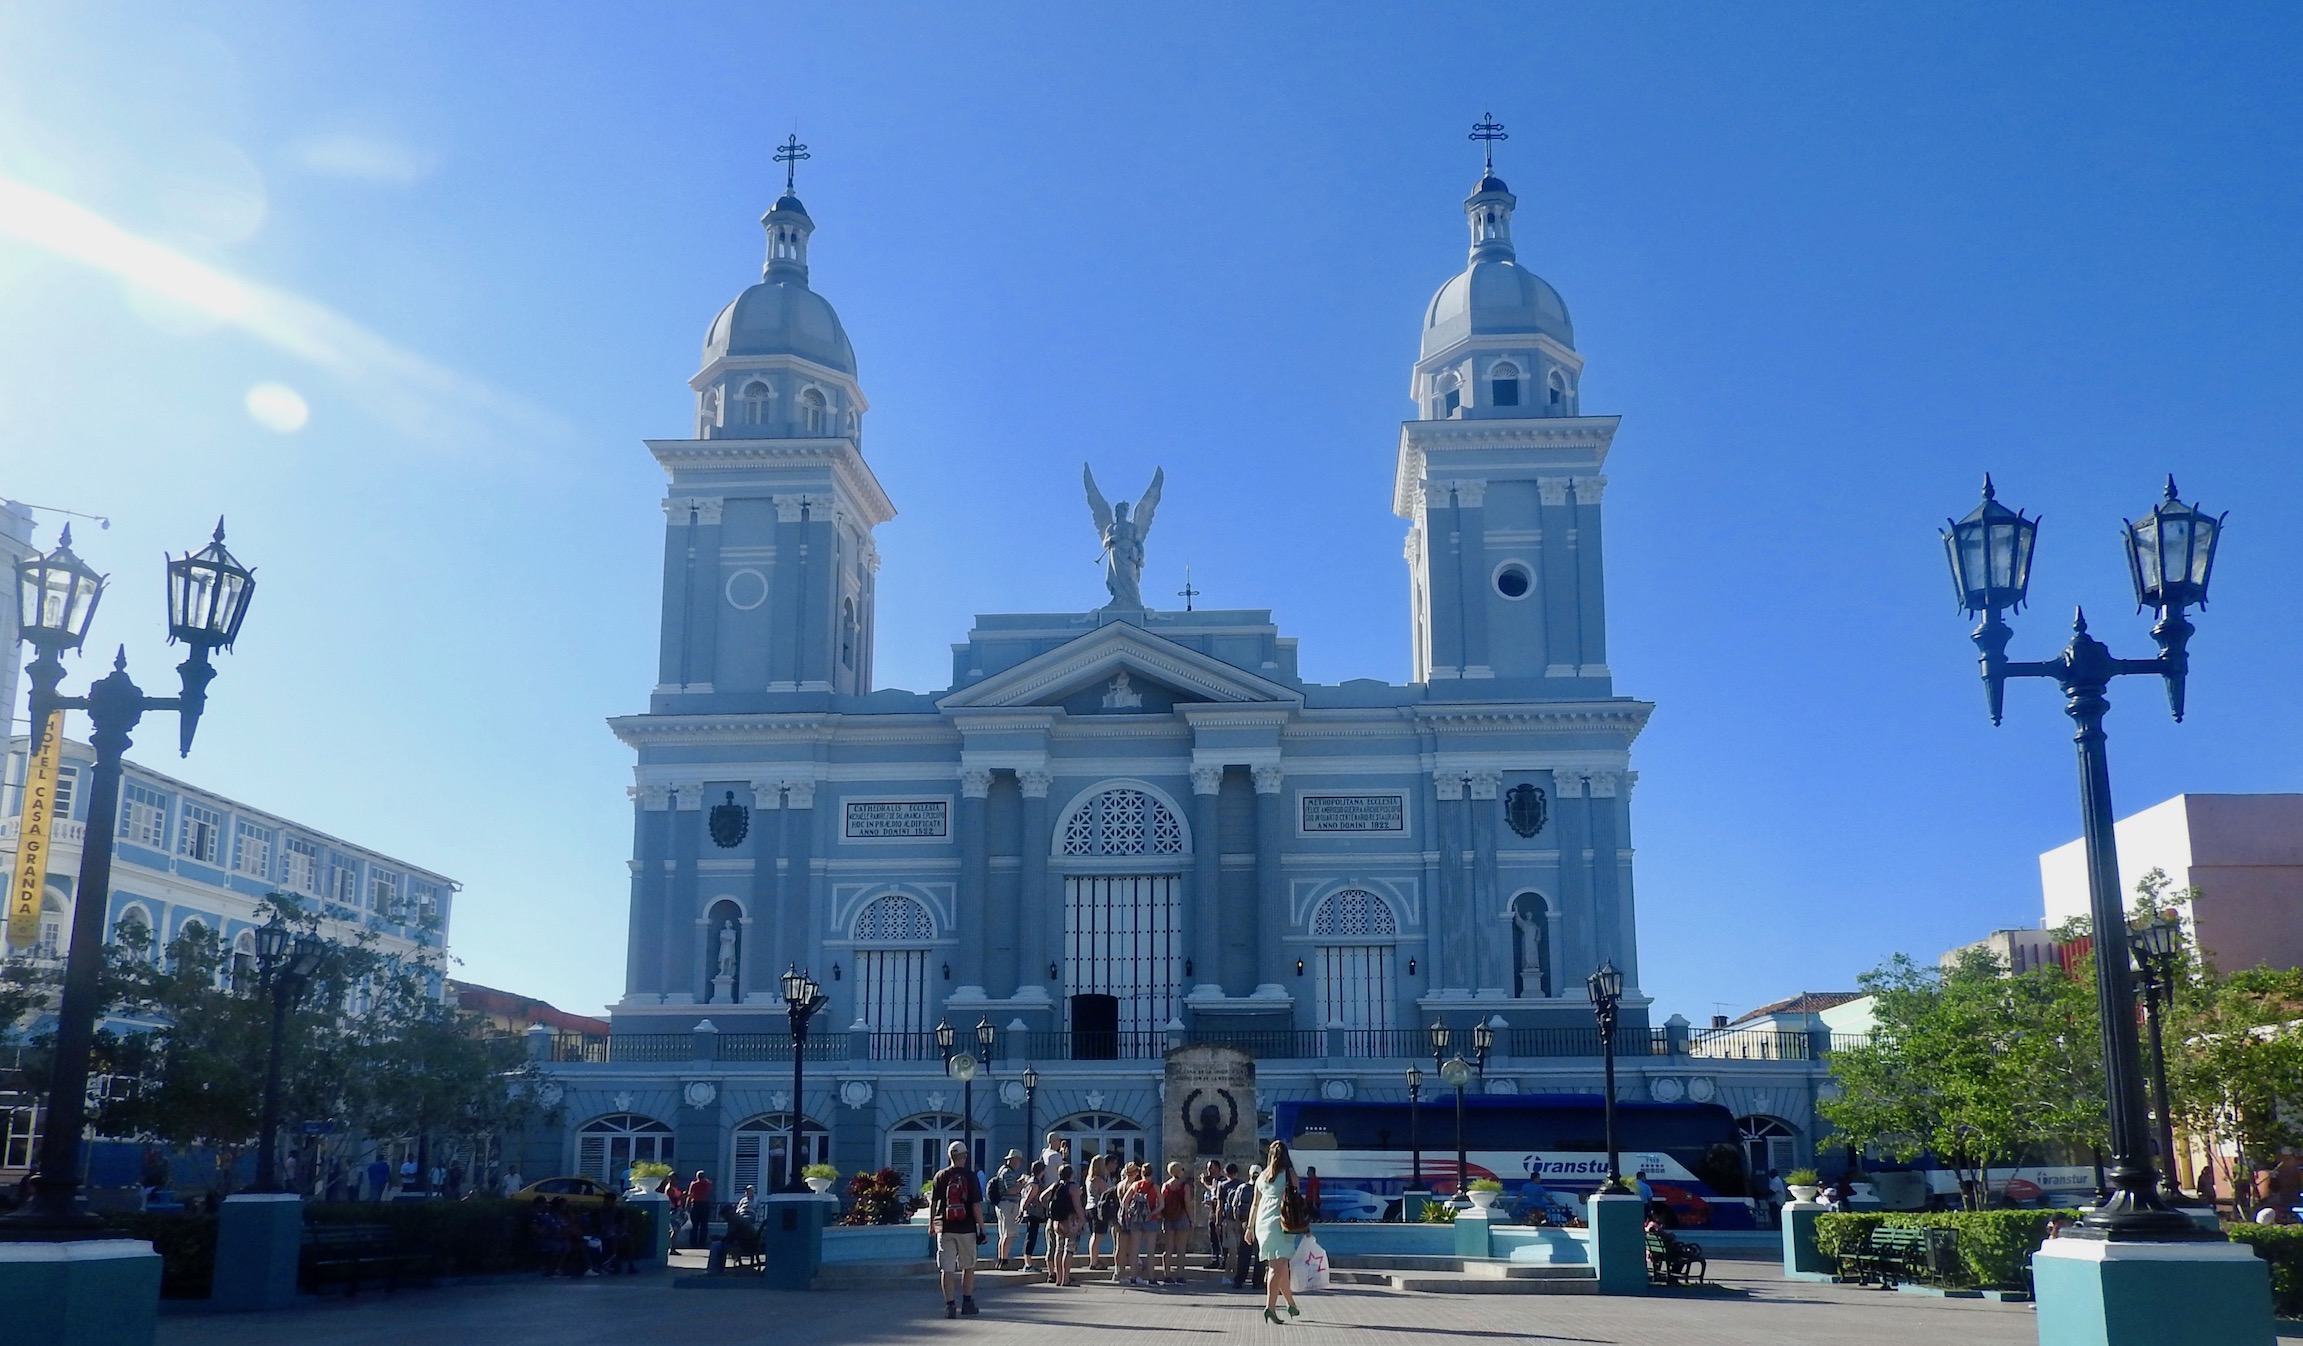 Santiago de Cuba Cathedral